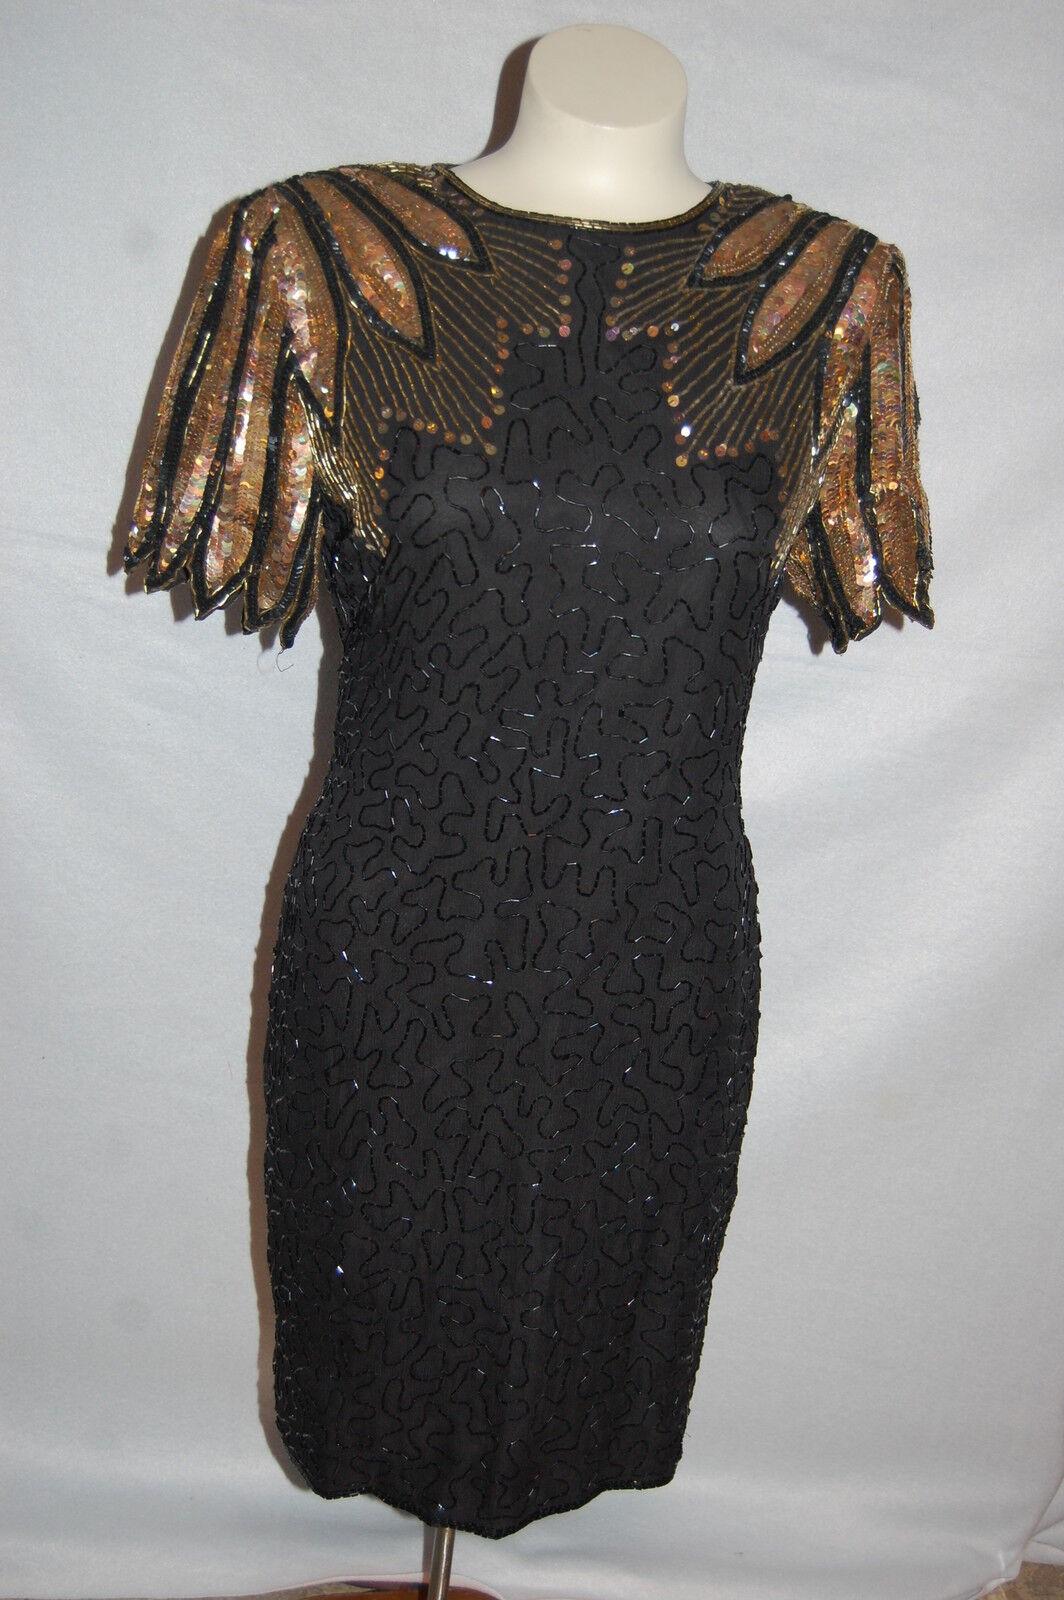 d85b1ec9b9 Womens Black Gold Beaded Sequin Dress Vintage 80s Stenay Party ...